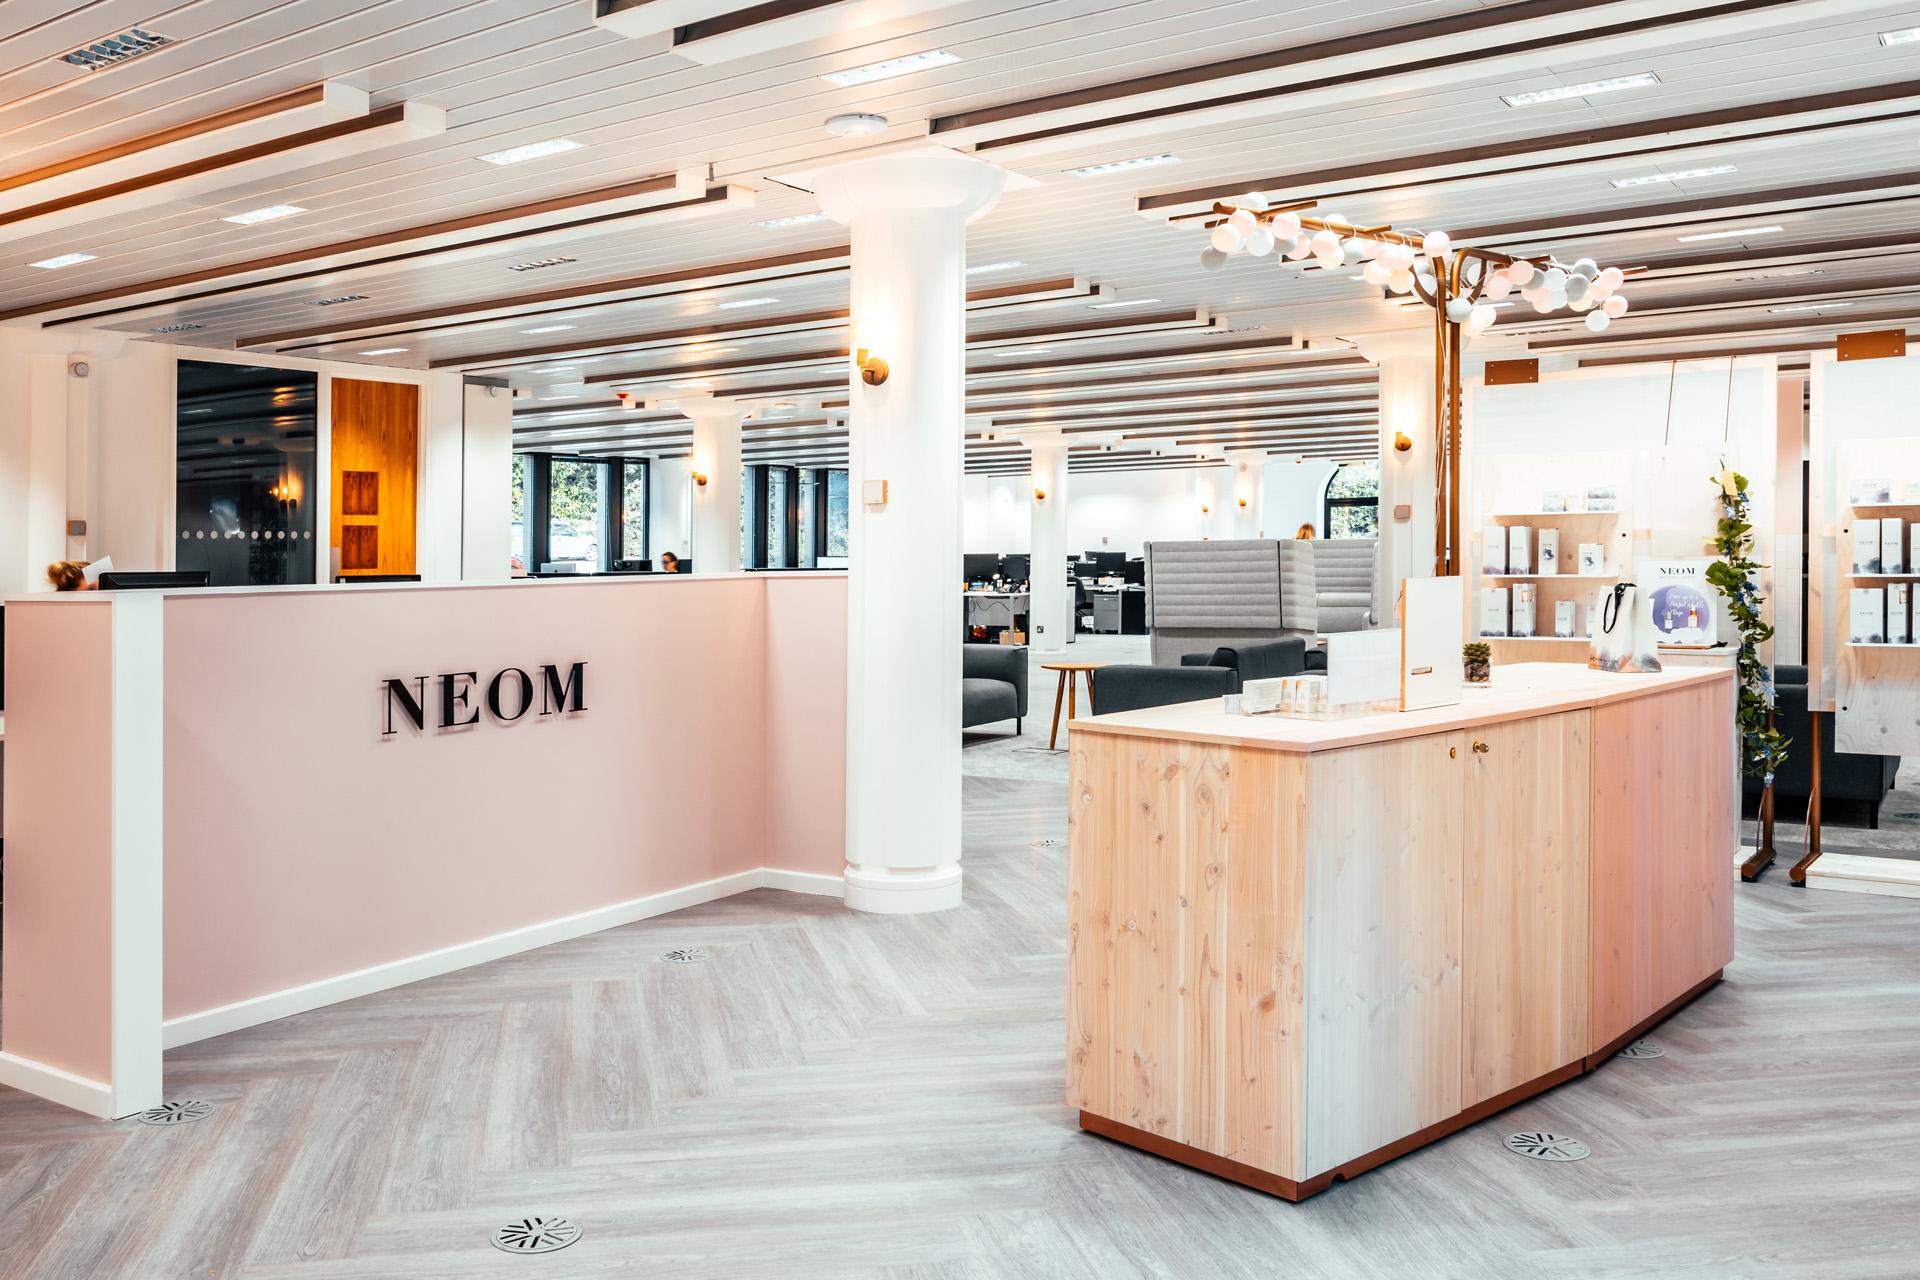 Neom-2018-07-19-1.jpg